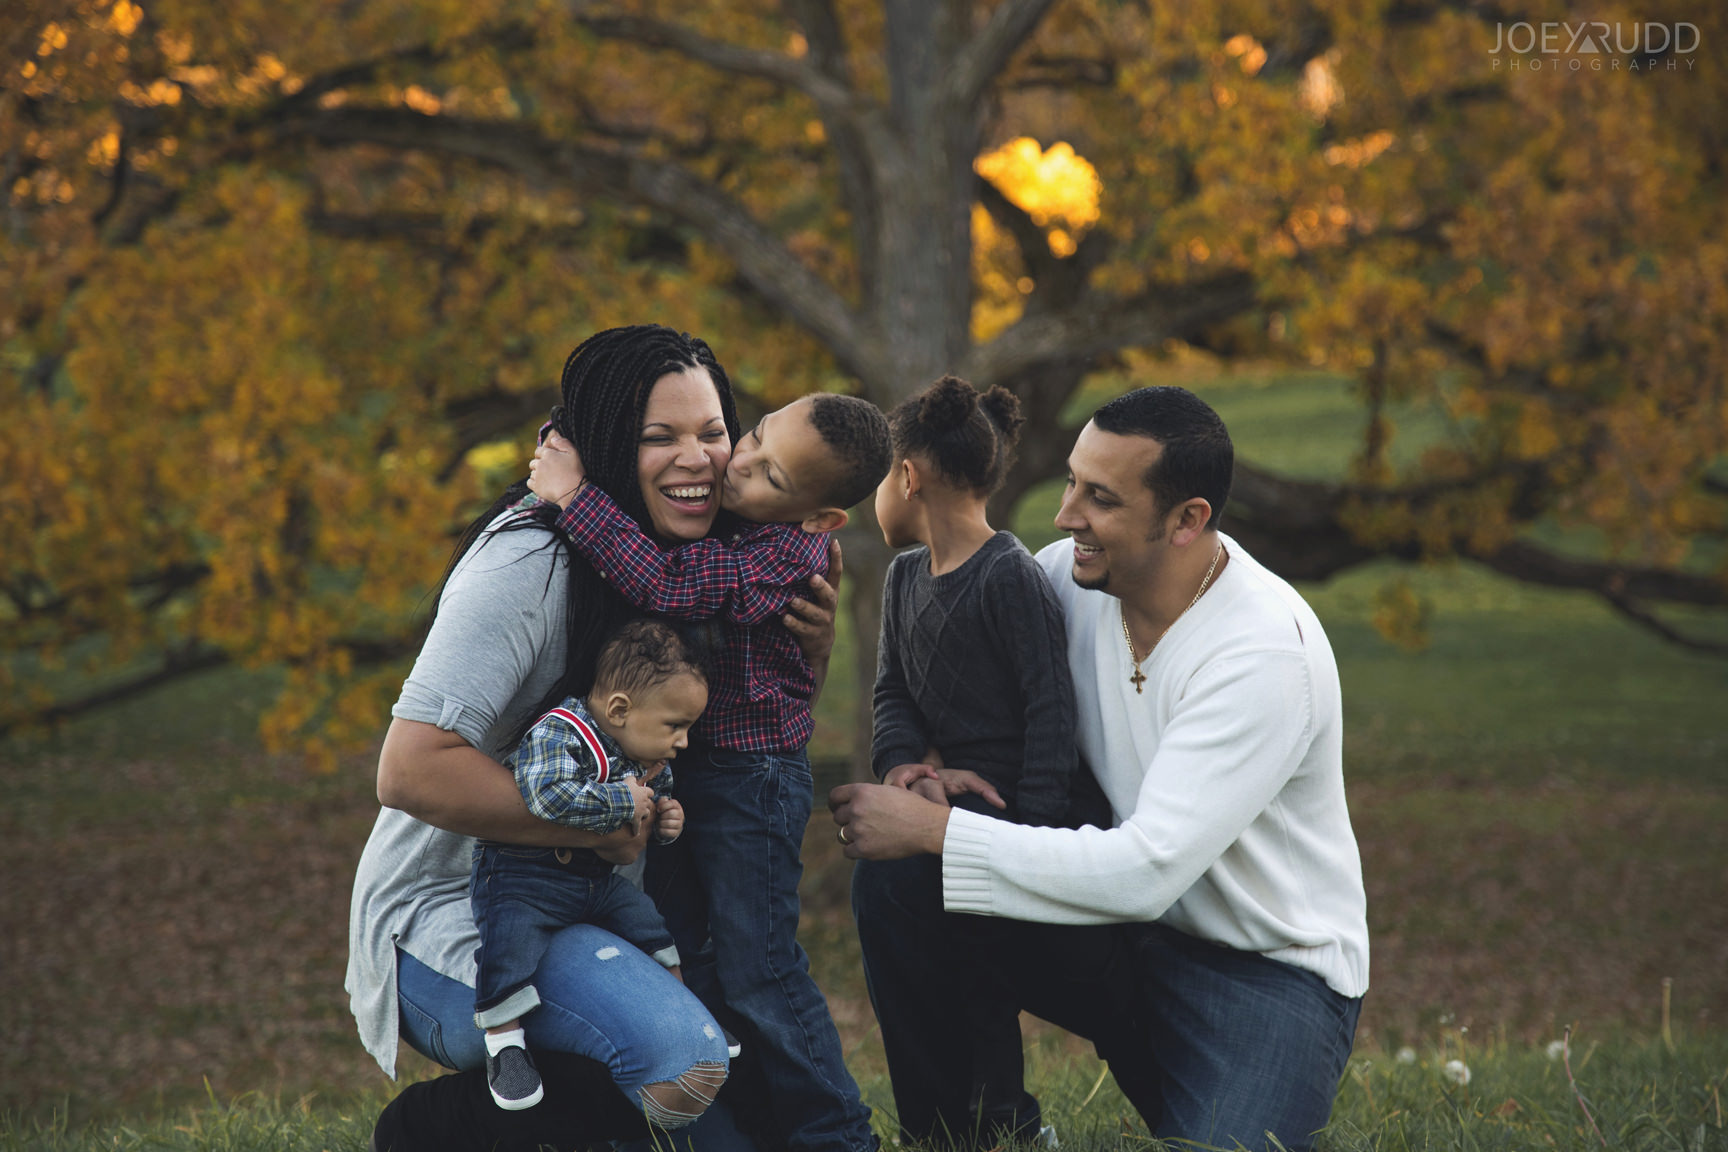 Ottawa Family Photographer Joey Rudd Photography Family Photo Session Arboretum Candid Fun Portrait Session